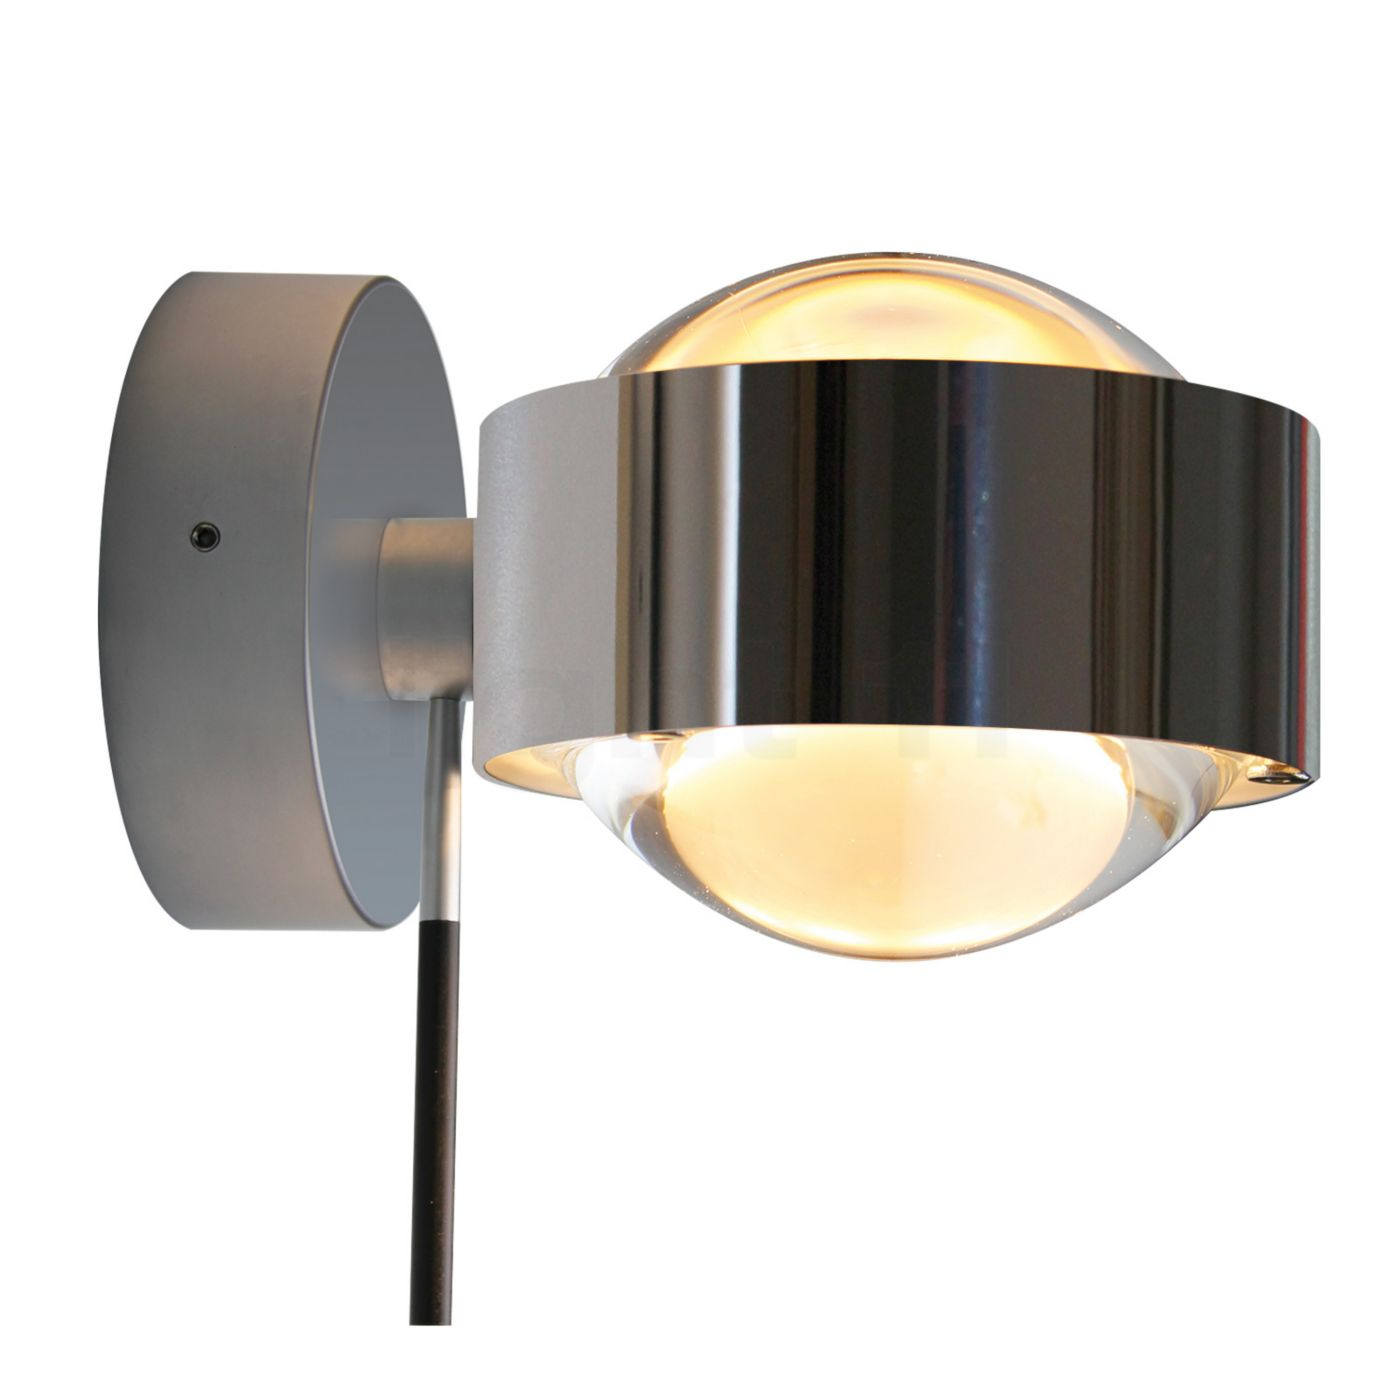 top light puk maxx wall wandlamp kopen op. Black Bedroom Furniture Sets. Home Design Ideas